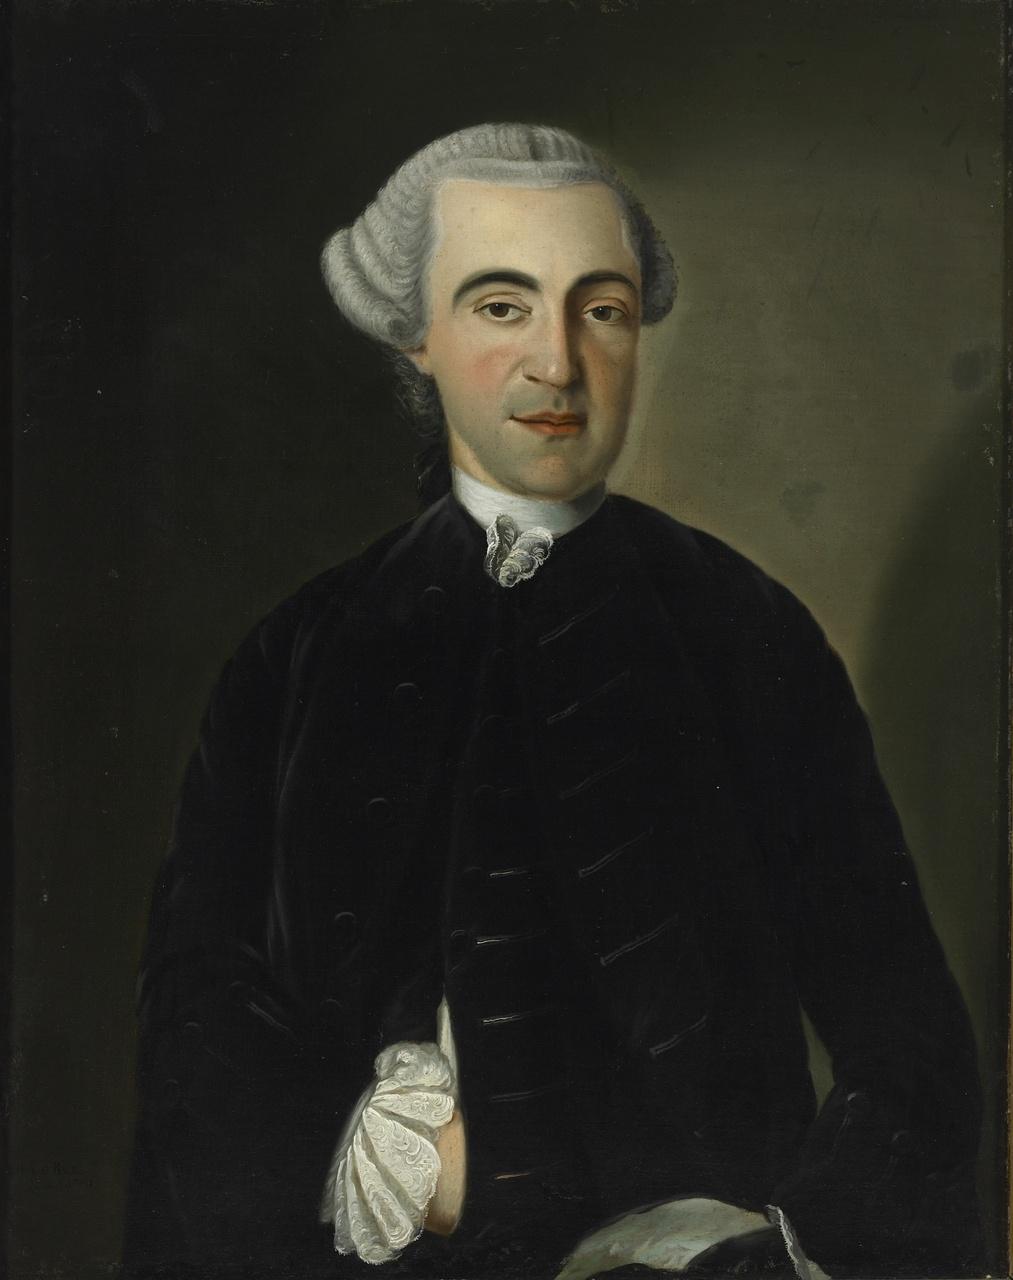 Mr. M.C. Versluys (1723-1811), H.A.C.H. Baur